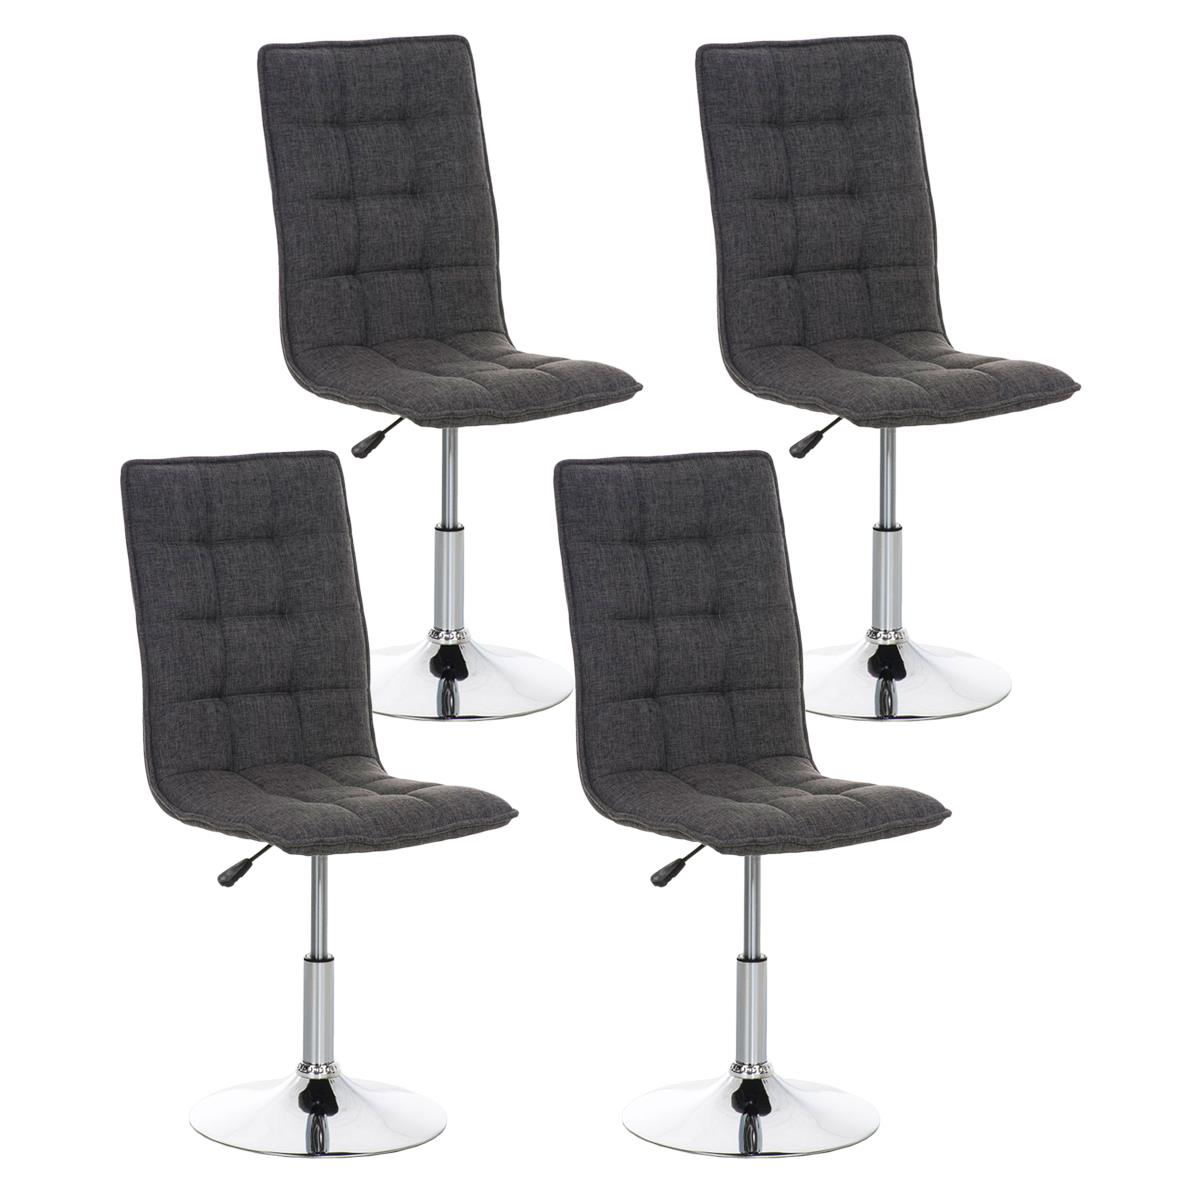 Conjunto de 4 sillas de comedor o cocina pescara en tela for Sillas de comedor tapizadas en gris